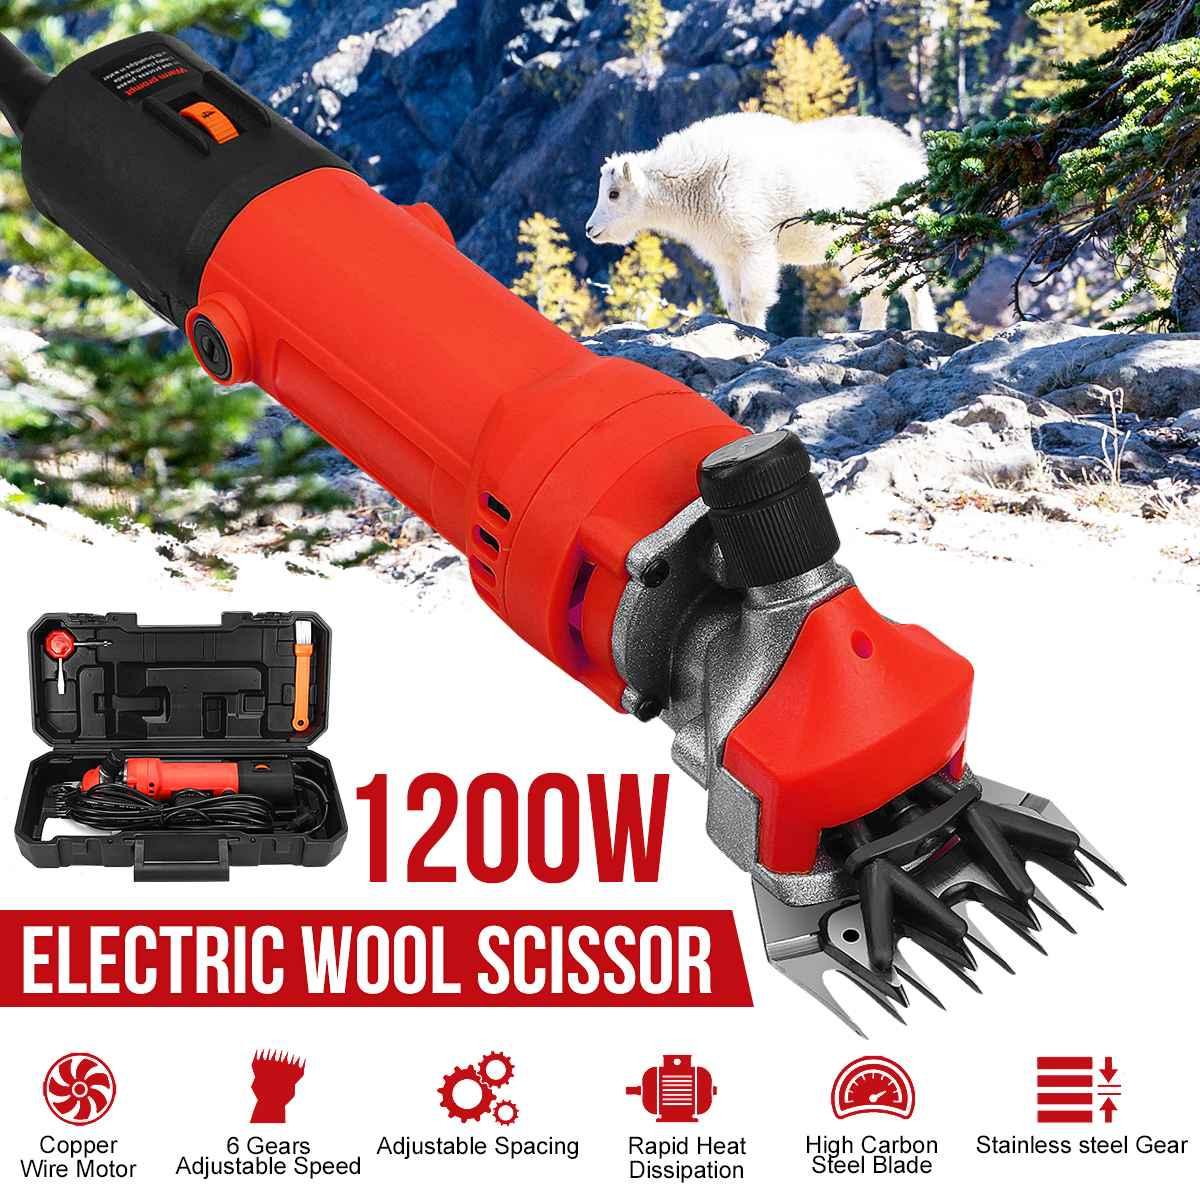 6 gears 1200W 110V/220V Electric Sheep Shearing Cutter Scissor Goat Wool Shaving Adjustment Push Trimmer Tool cutter machine